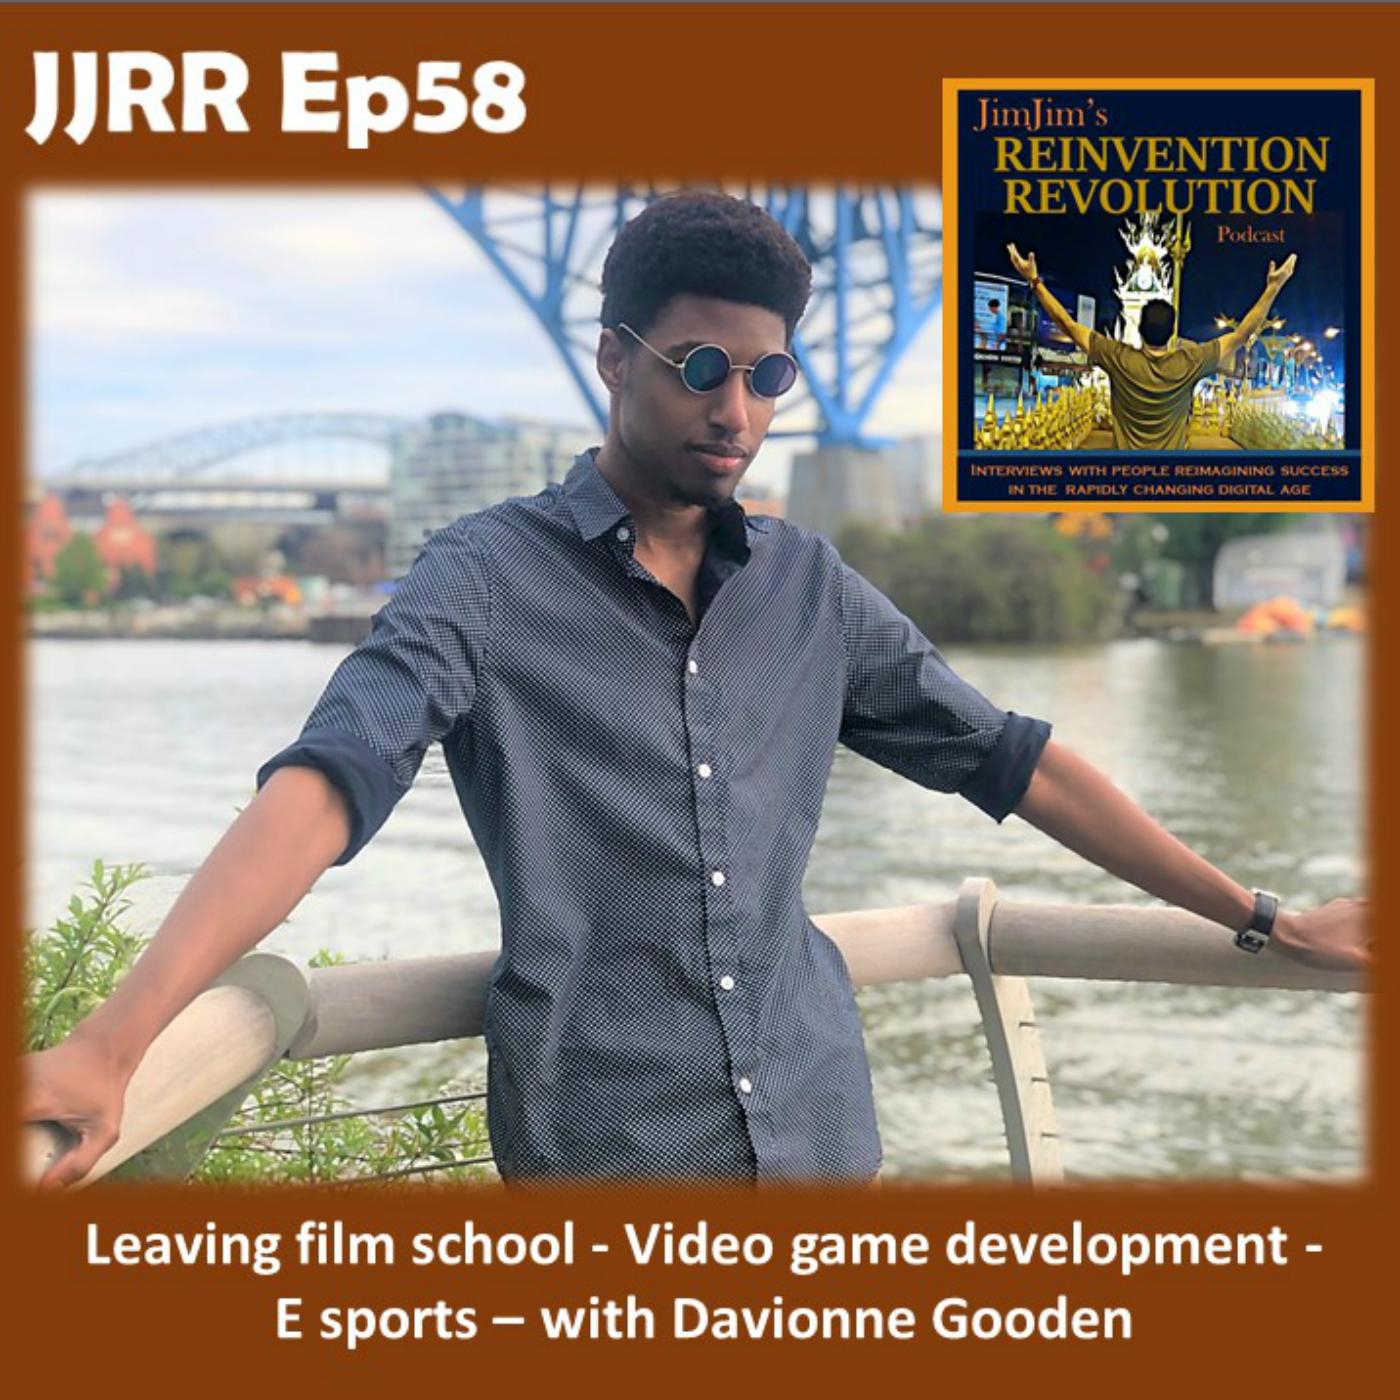 JJRR 58 Leaving film school – Video game development – E sports – with Davionne Gooden